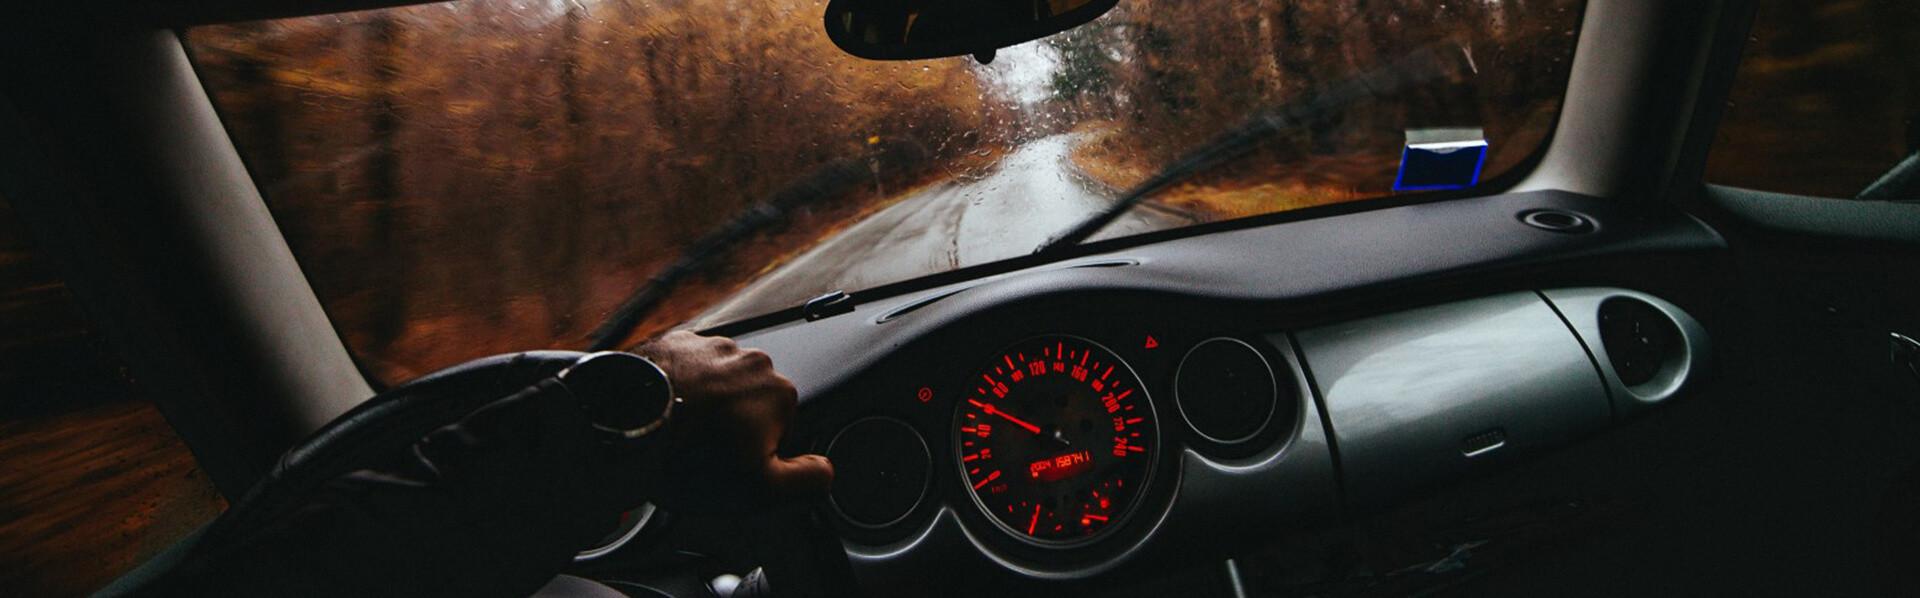 deca136ae665a95 - GPS Tracker - OBD2 Treyki Auto GPS Tracking-Set | Easytrack